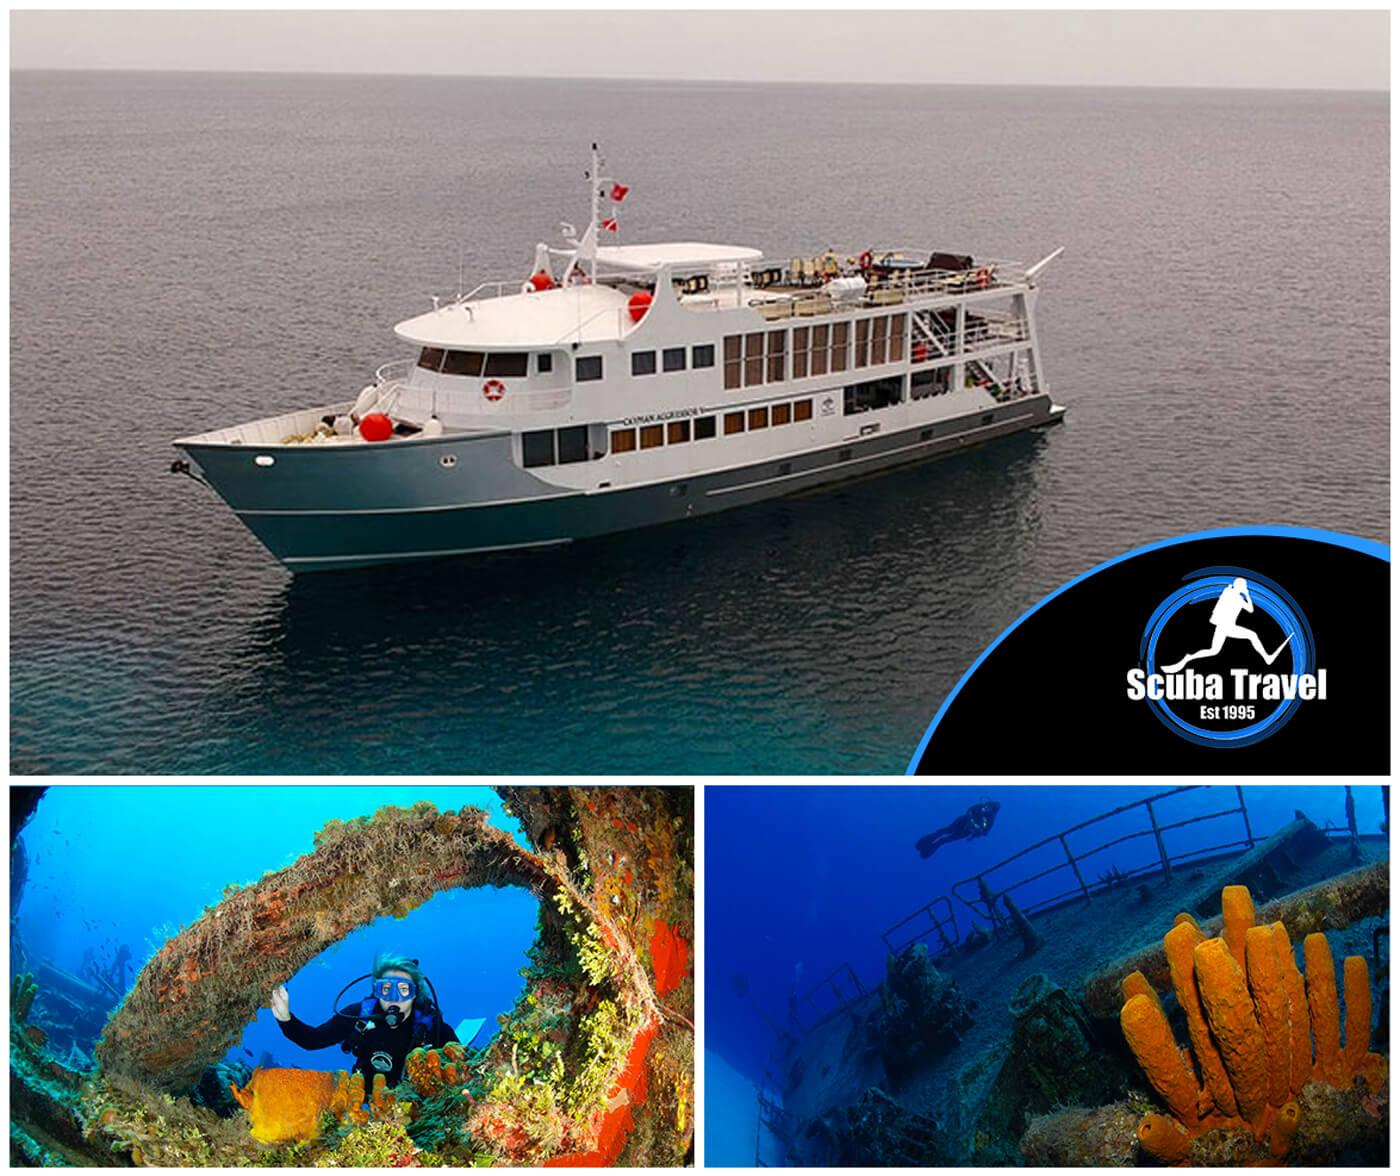 Scuba Travel, Cayman Aggressor, Cayman Islands